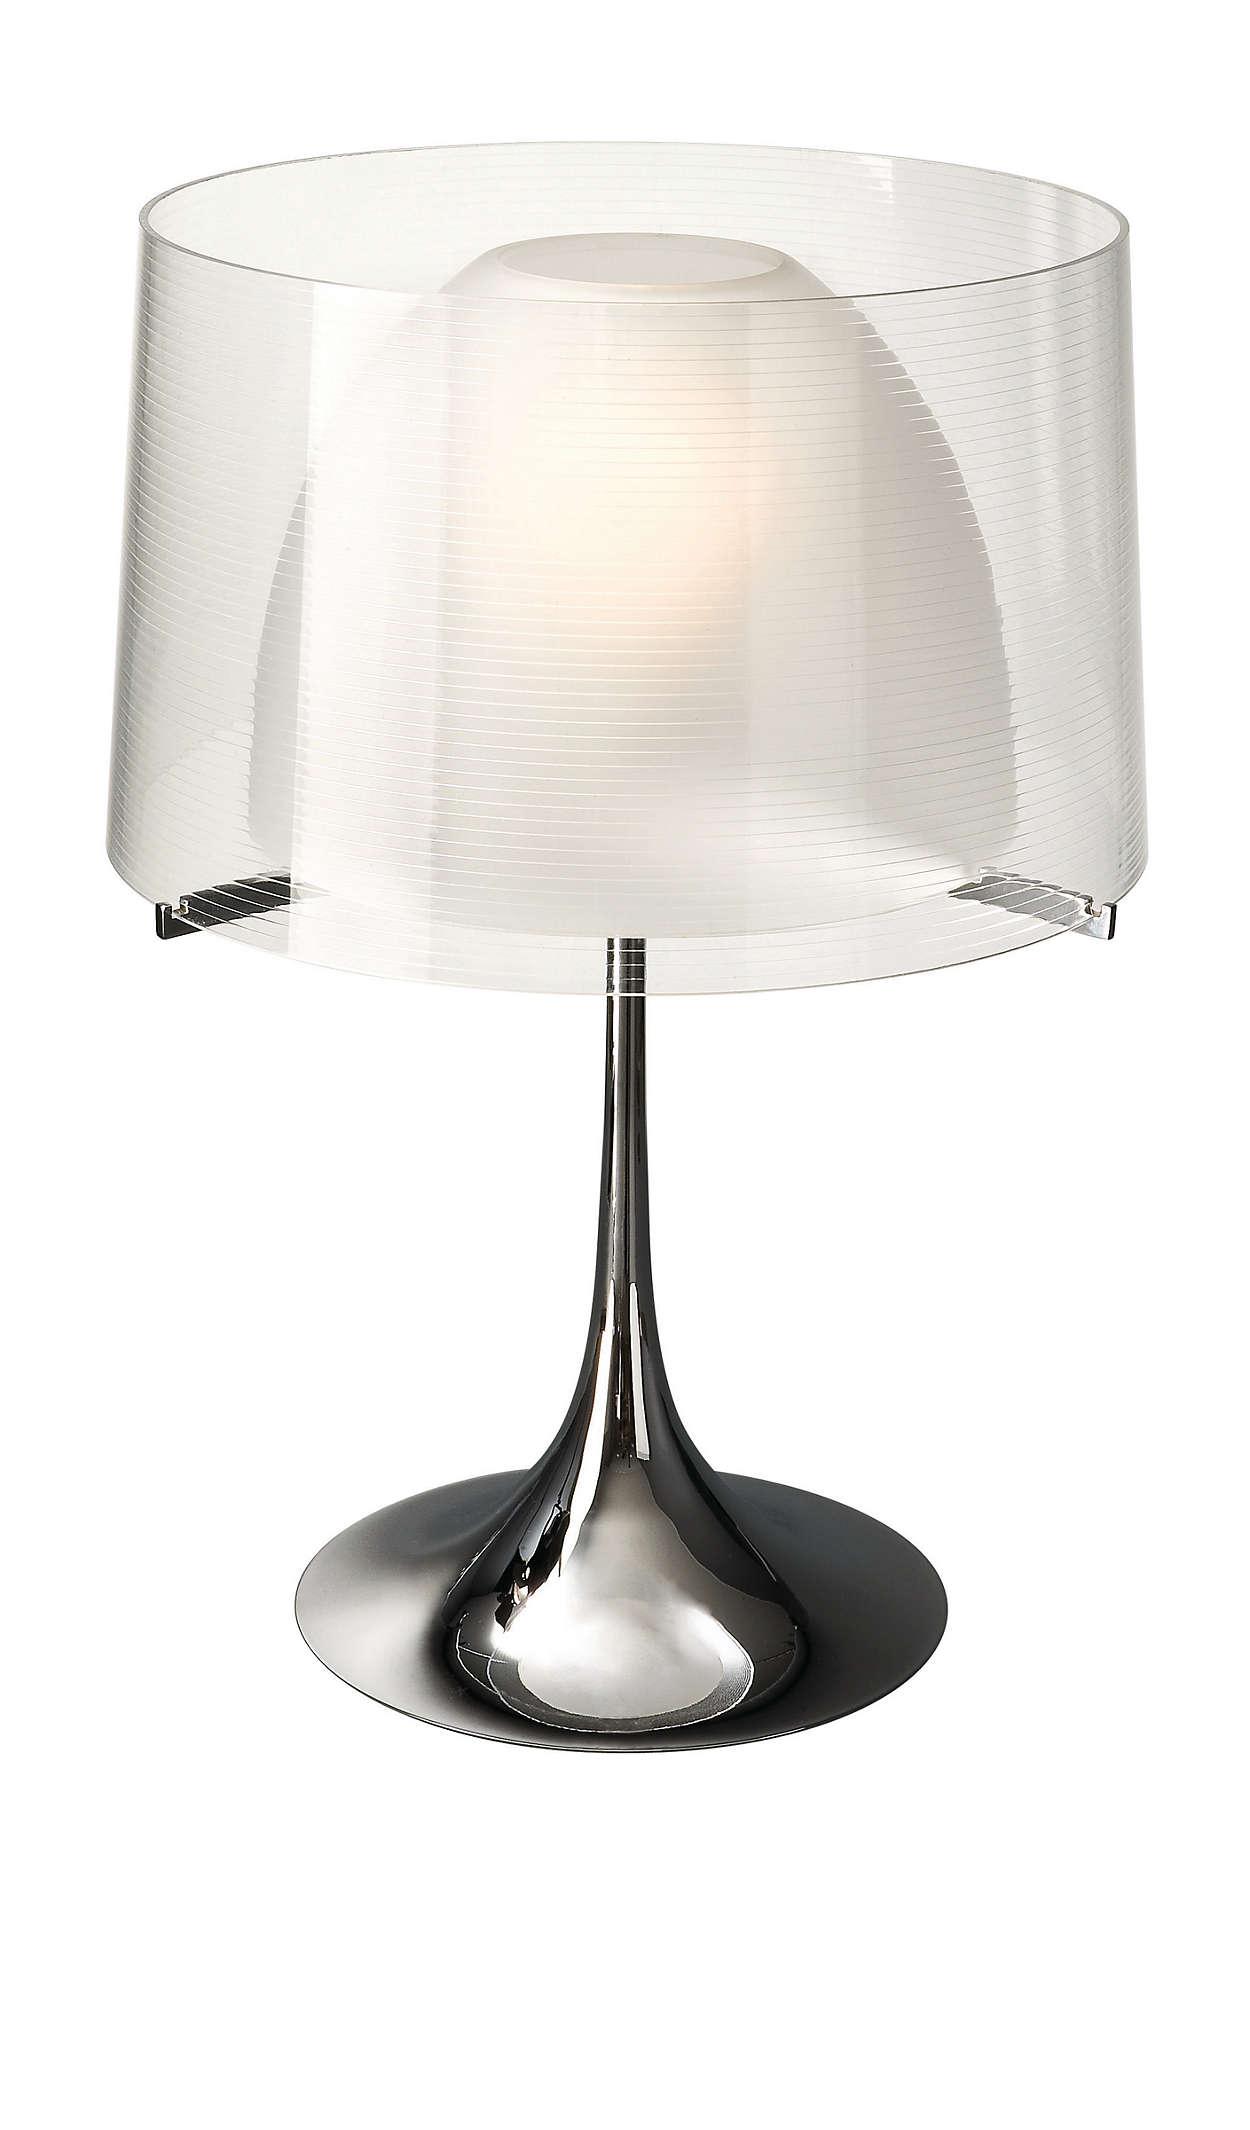 Luo valoja ja varjoja